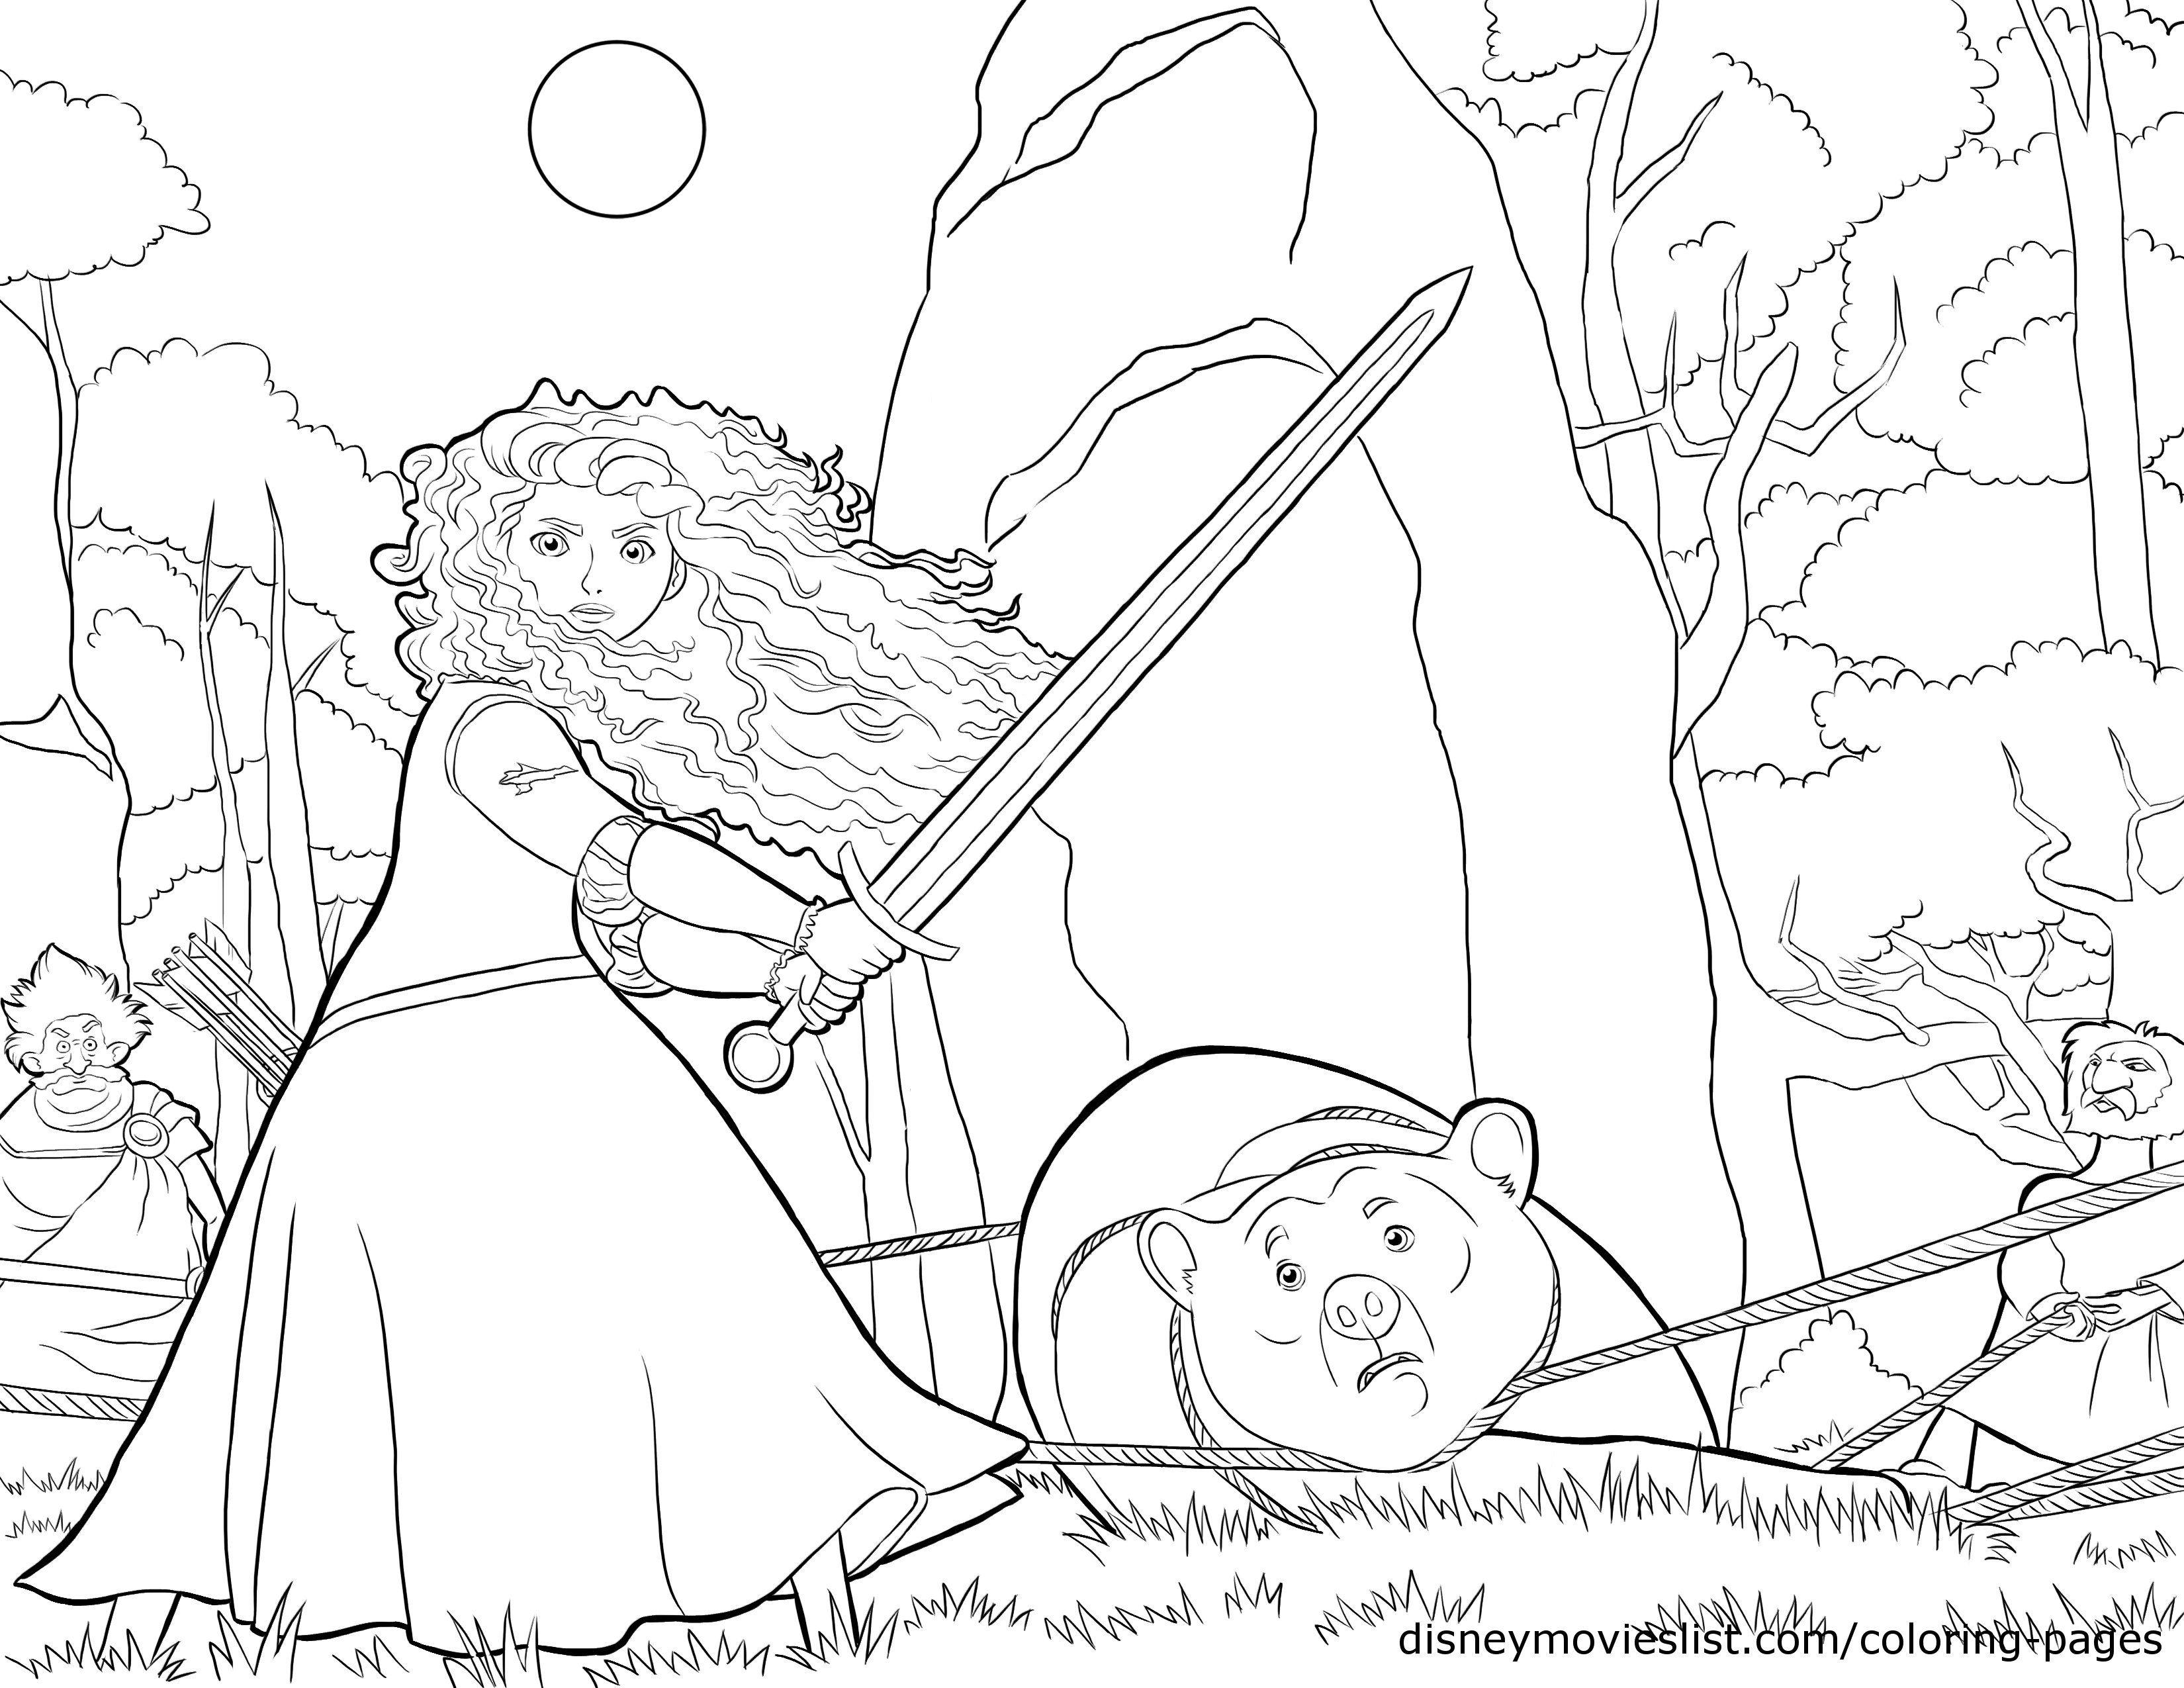 Brave Coloring Book Eassume Com Bear Coloring Pages Coloring Pages Disney Princess Coloring Pages [ 2550 x 3300 Pixel ]